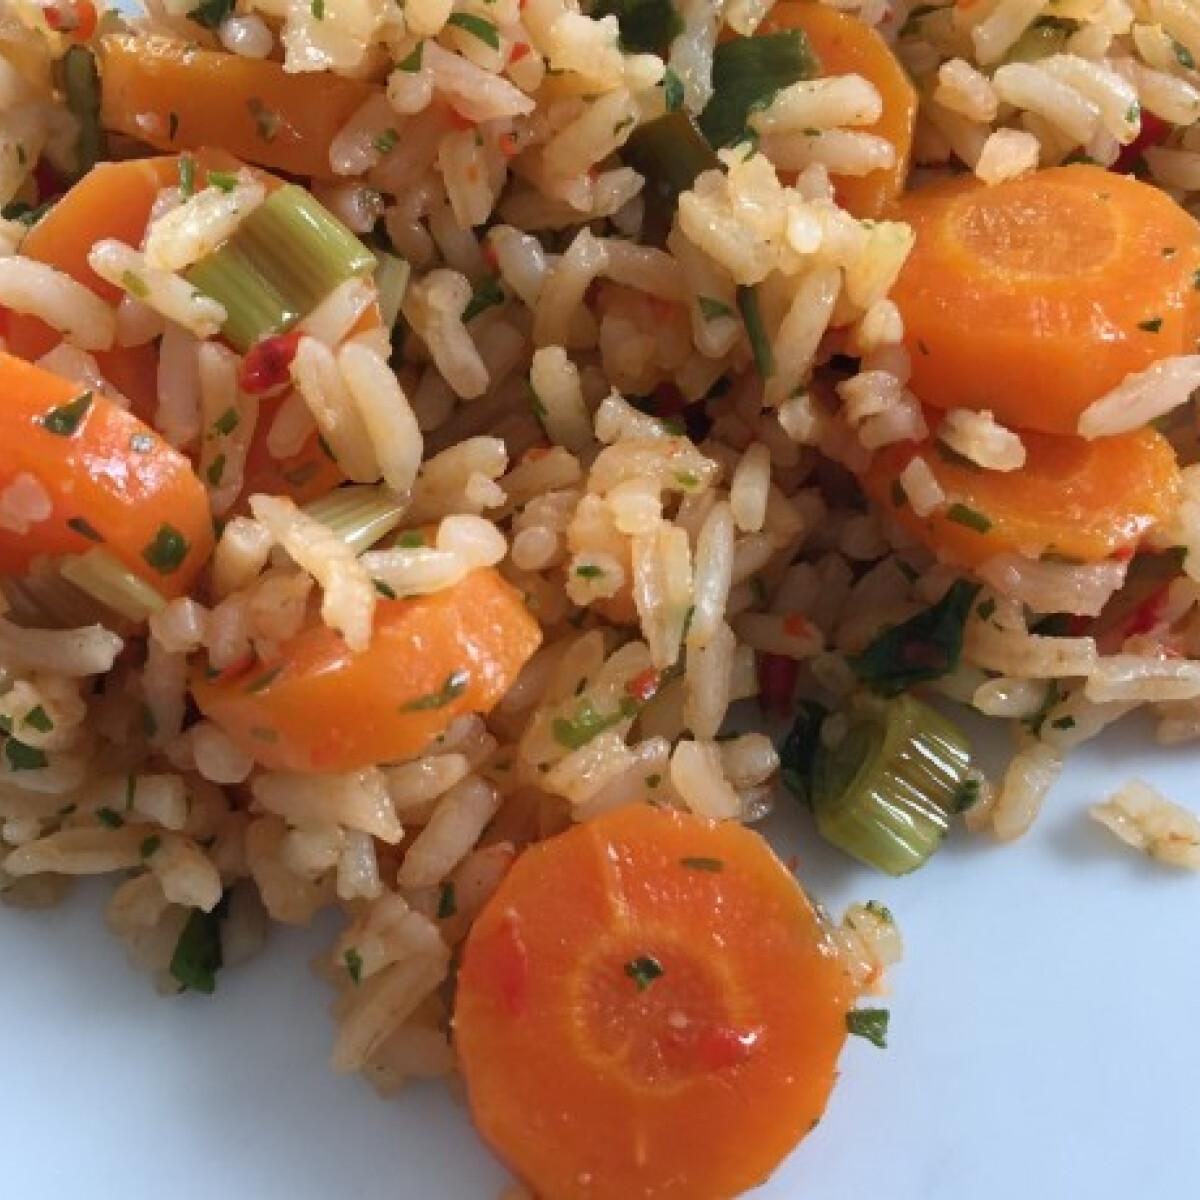 Tiritarka rizs